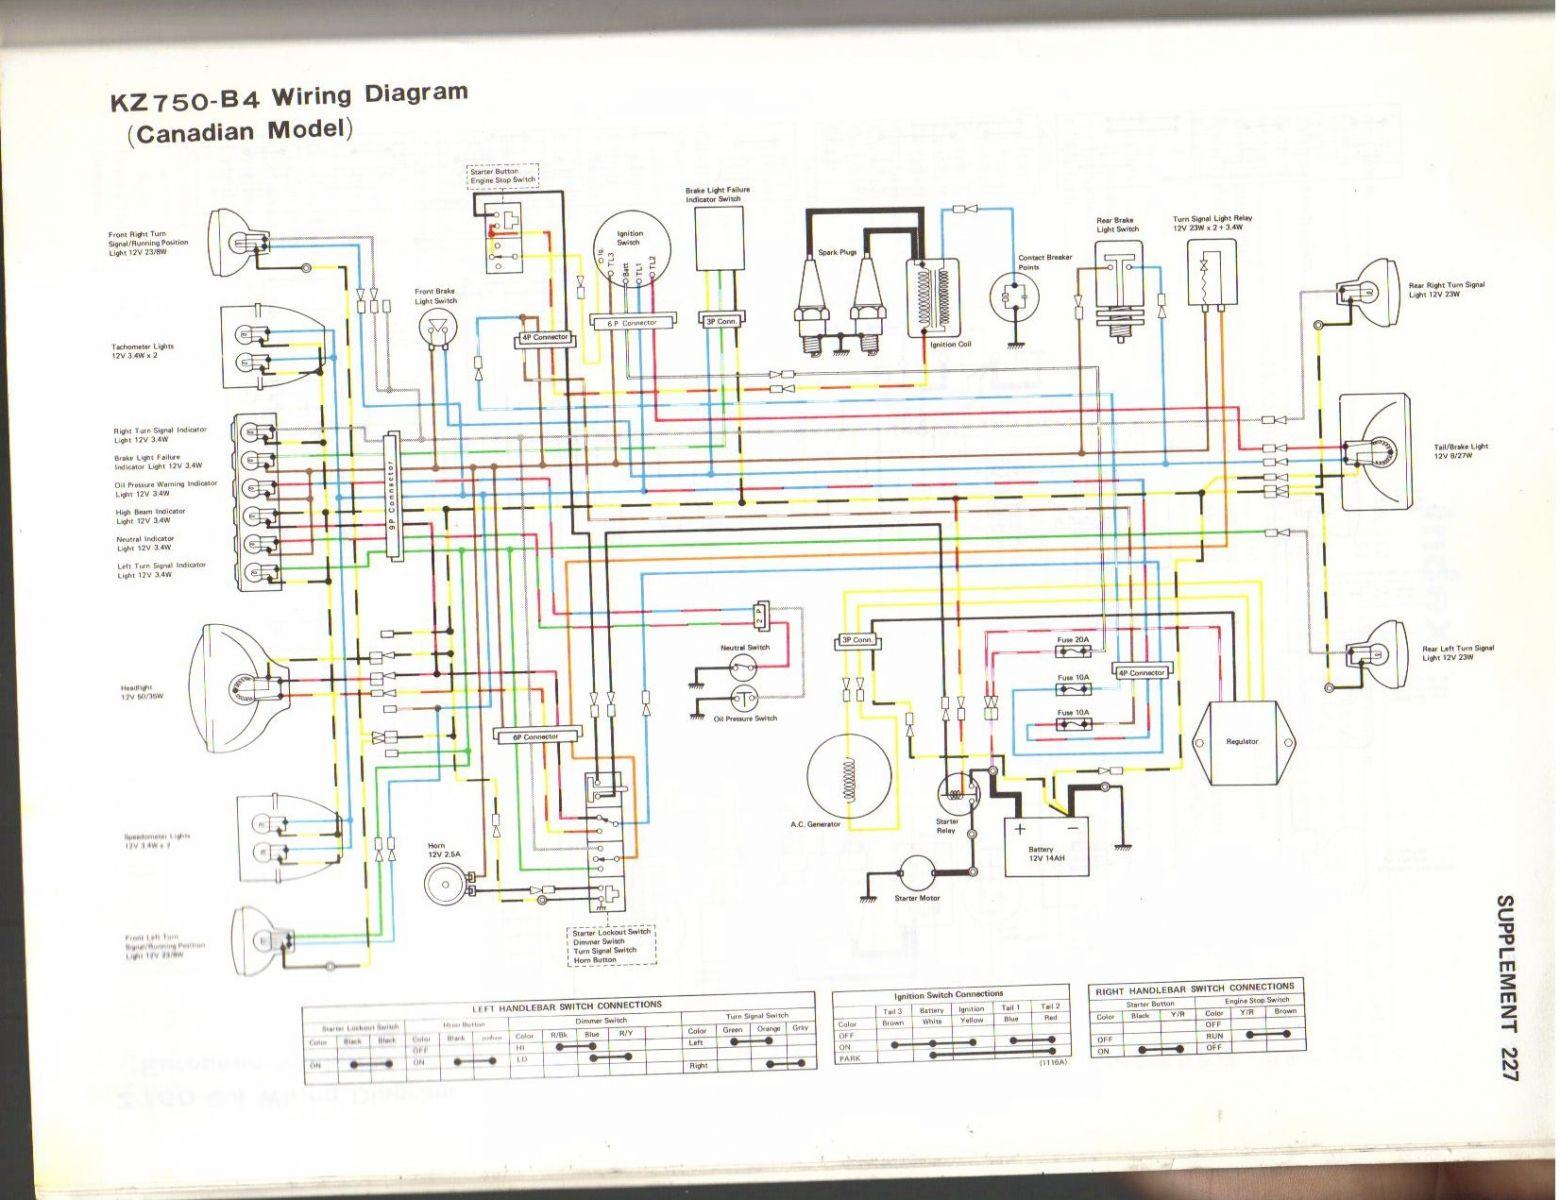 kz750b4wiringdiagram?resize\\\\\\\\\\\\\\\\\\\\\\\\\\\=665%2C512\\\\\\\\\\\\\\\\\\\\\\\\\\\&ssl\\\\\\\\\\\\\\\\\\\\\\\\\\\=1 c534638 sears wire diagram craftsman lawn tractor wiring diagram  at arjmand.co